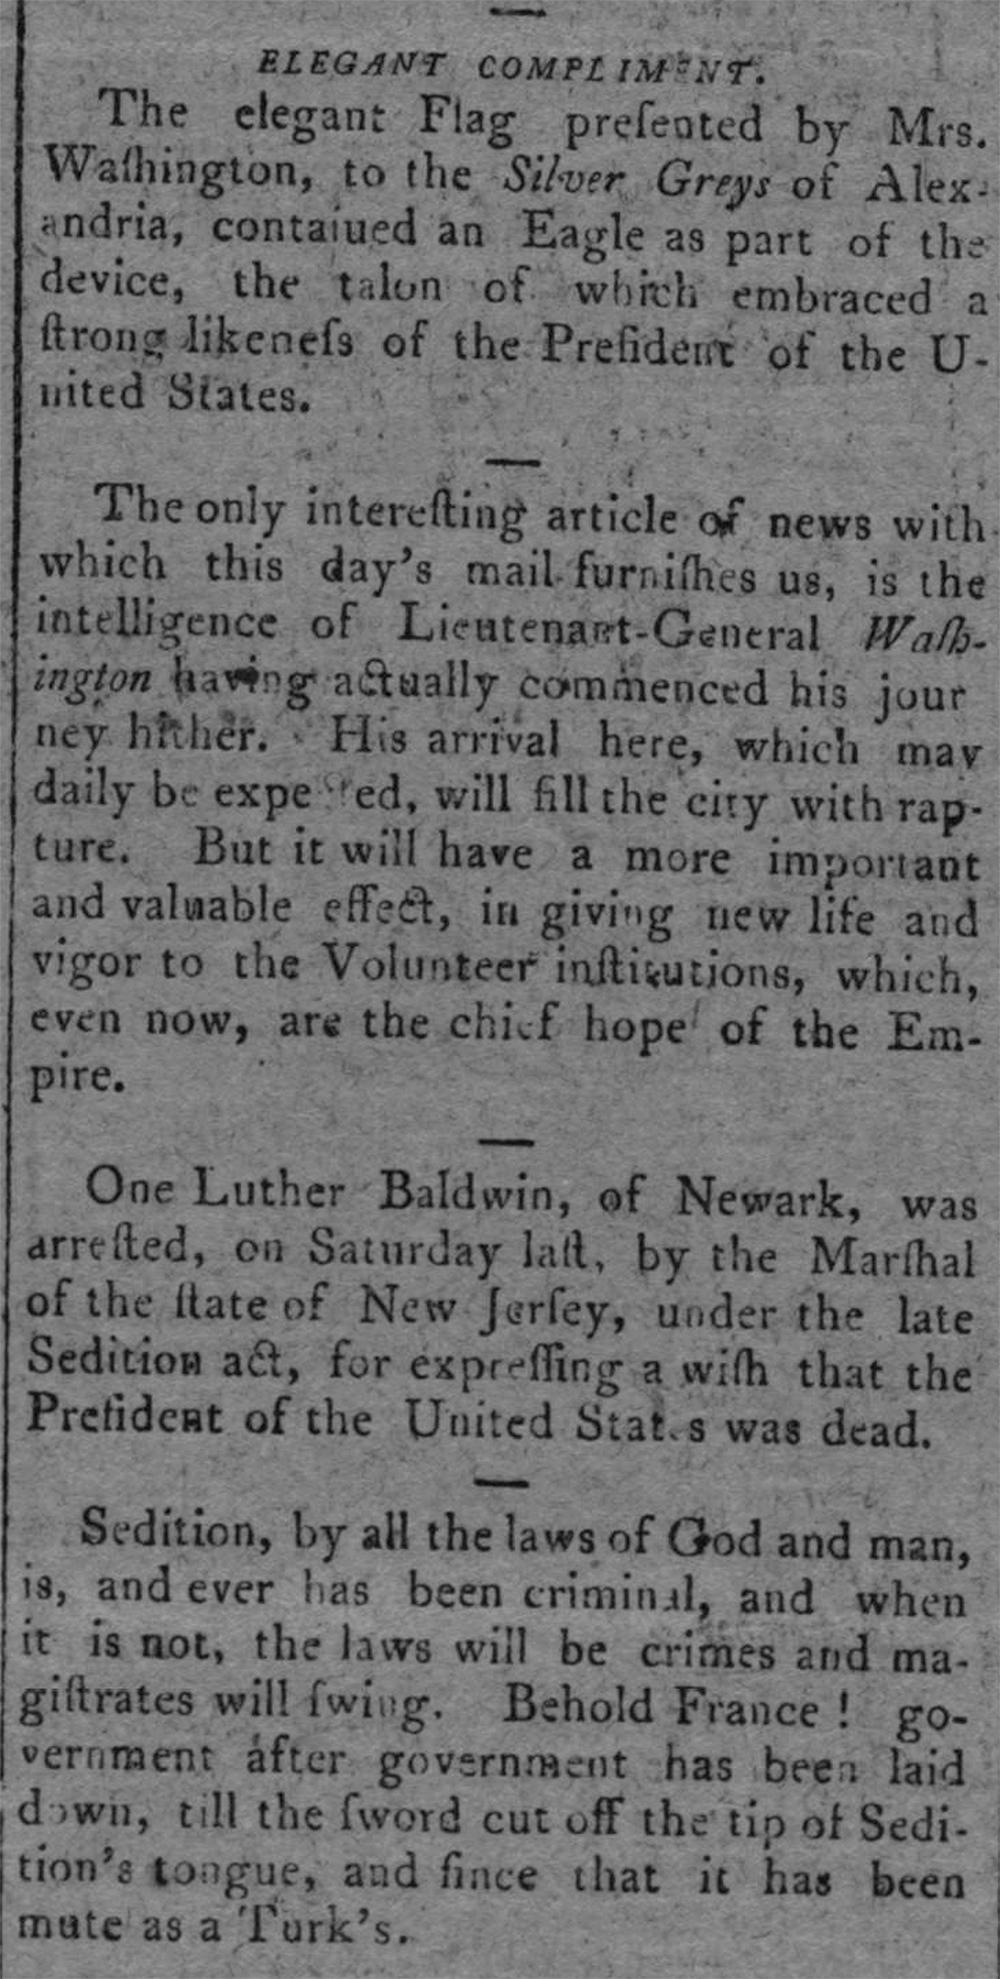 Philadelphia Daily Advertiser, November 8, 1798. Library of Congress, Chronicling America.